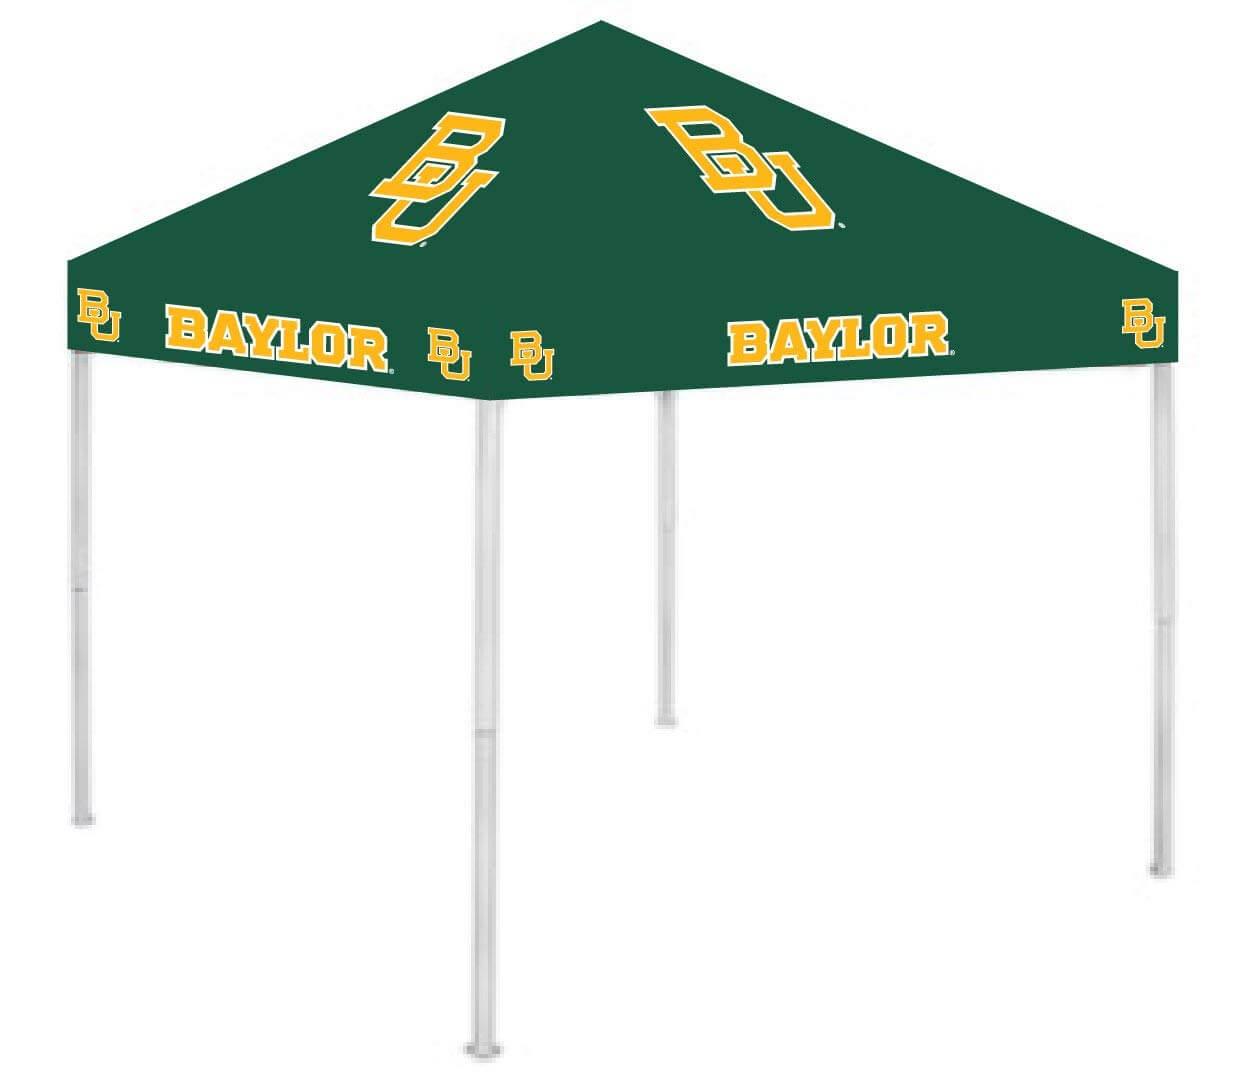 Tailgatecanopytent Baylor Bears Tailgate Canopy Tent